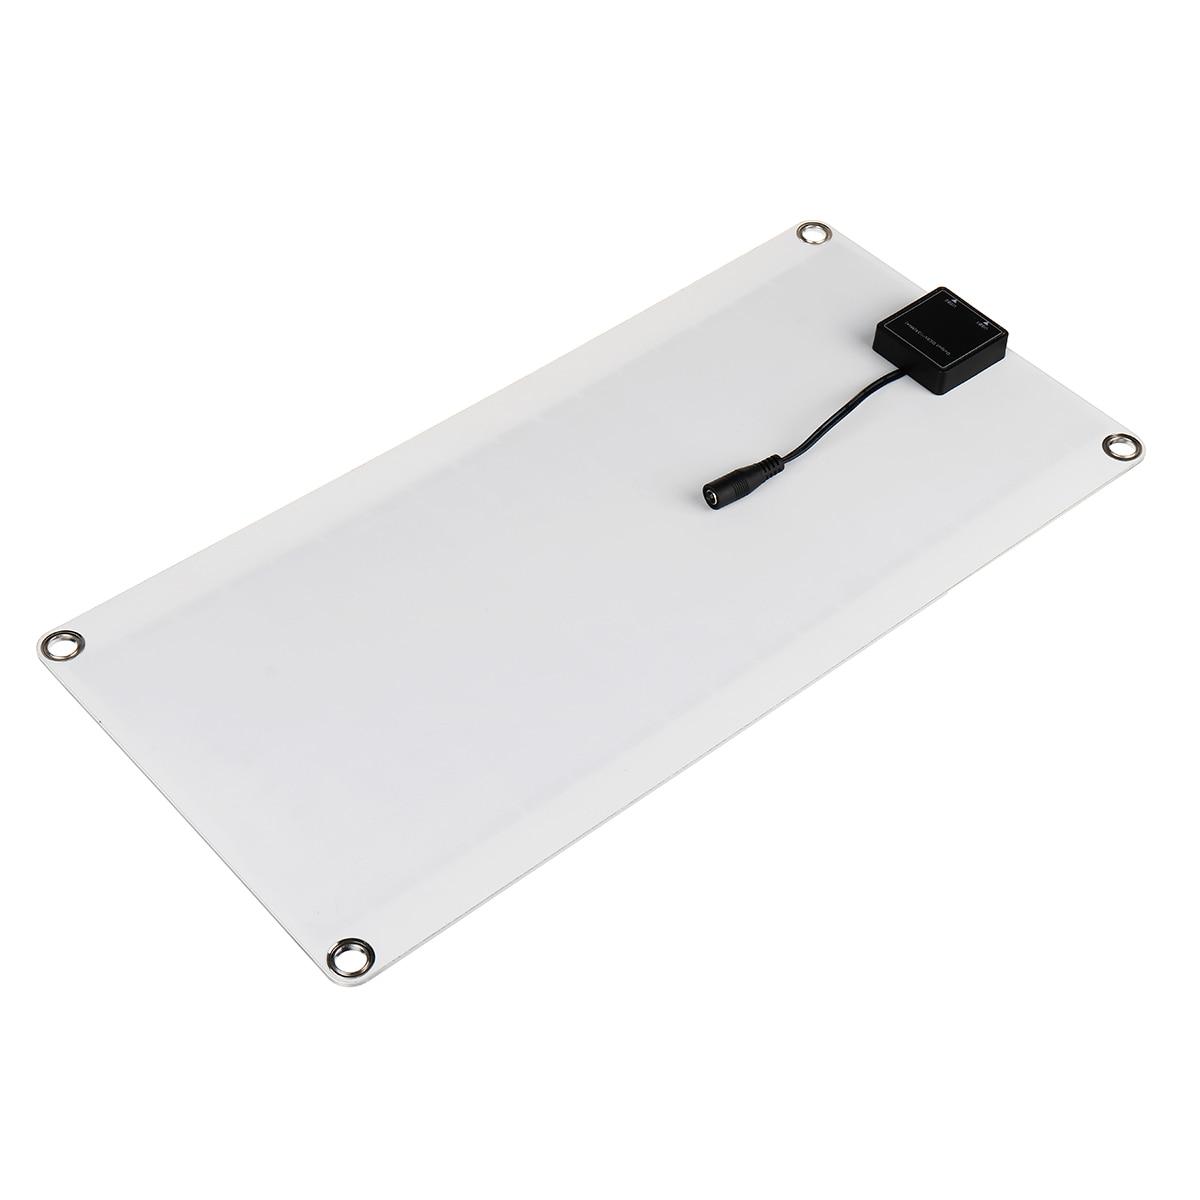 bateria externa carregador de carro placa de célula solar